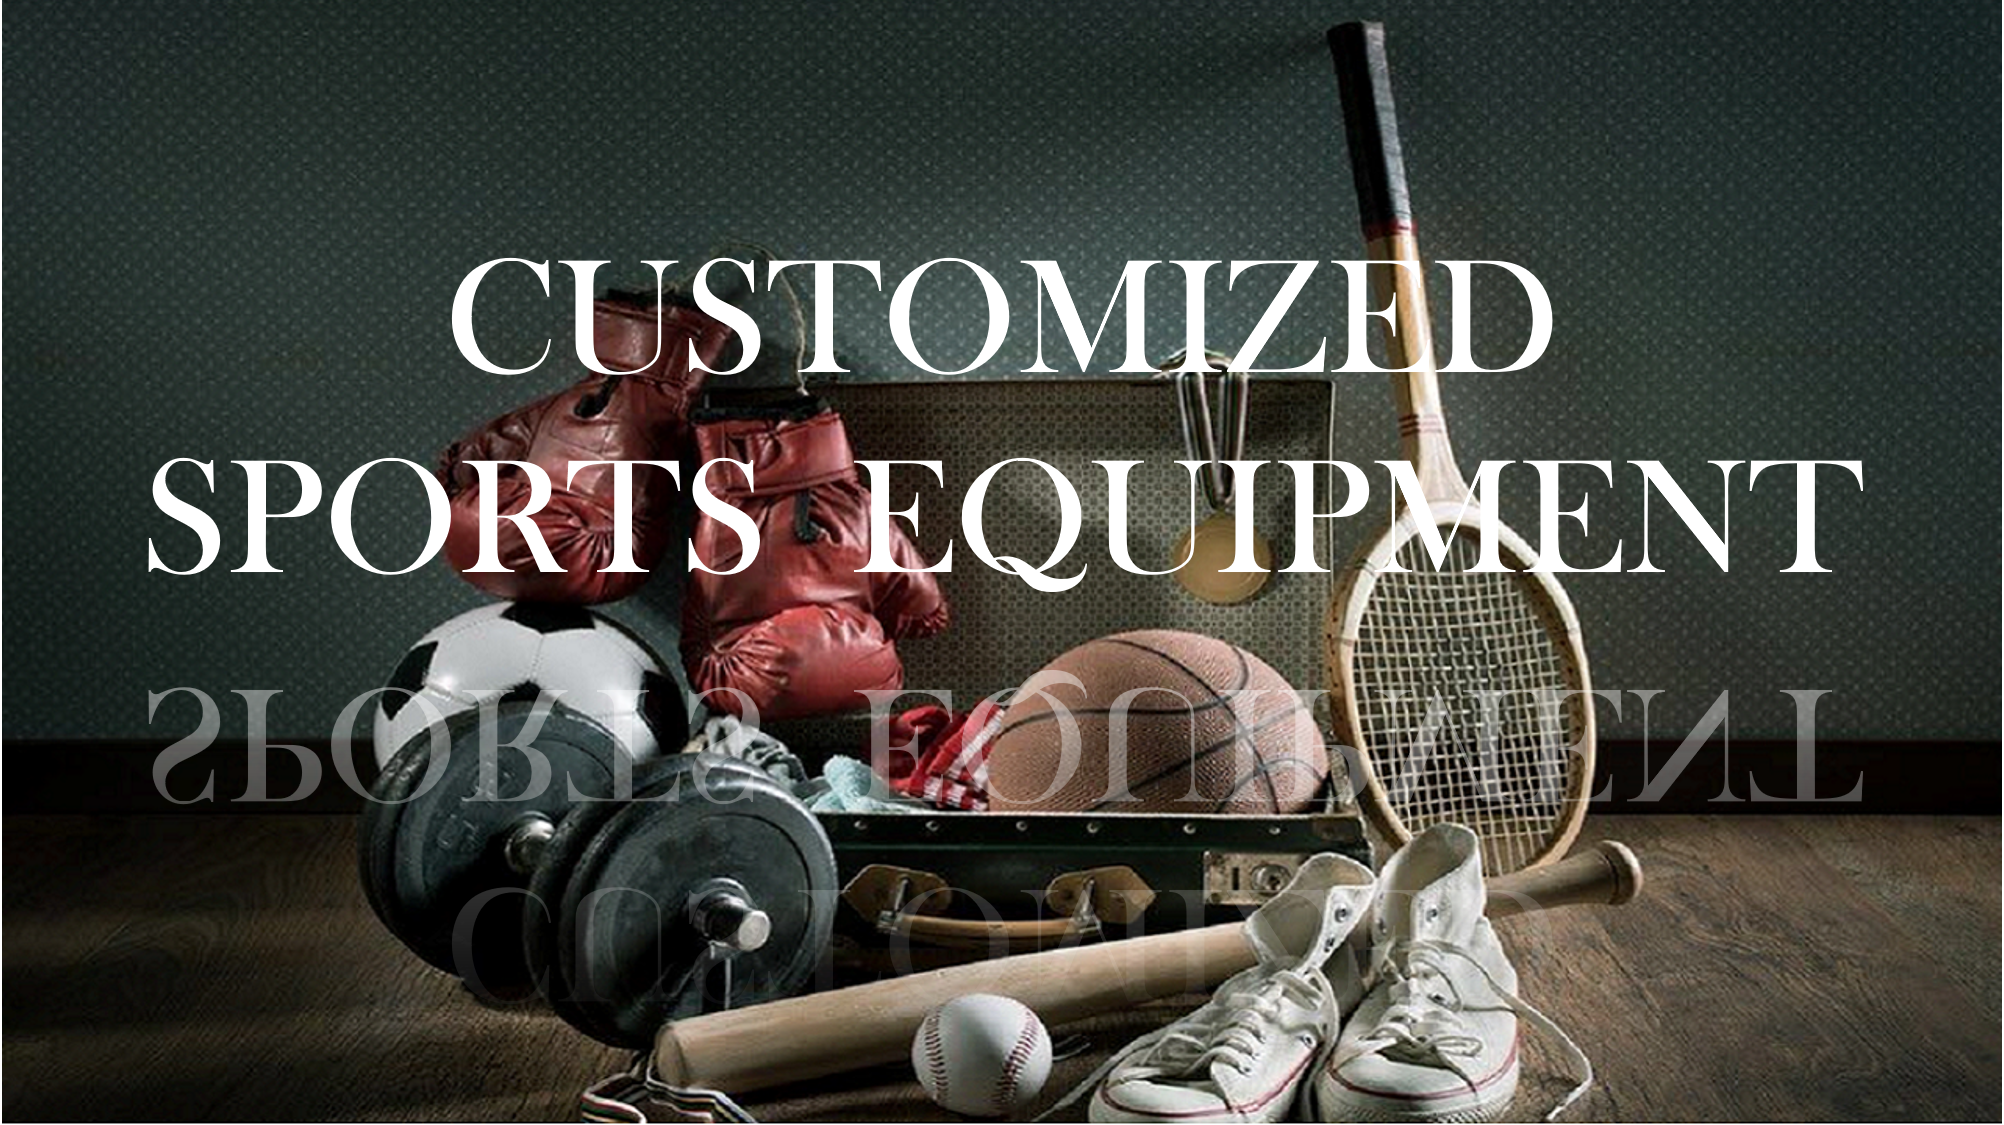 Customized Equipment